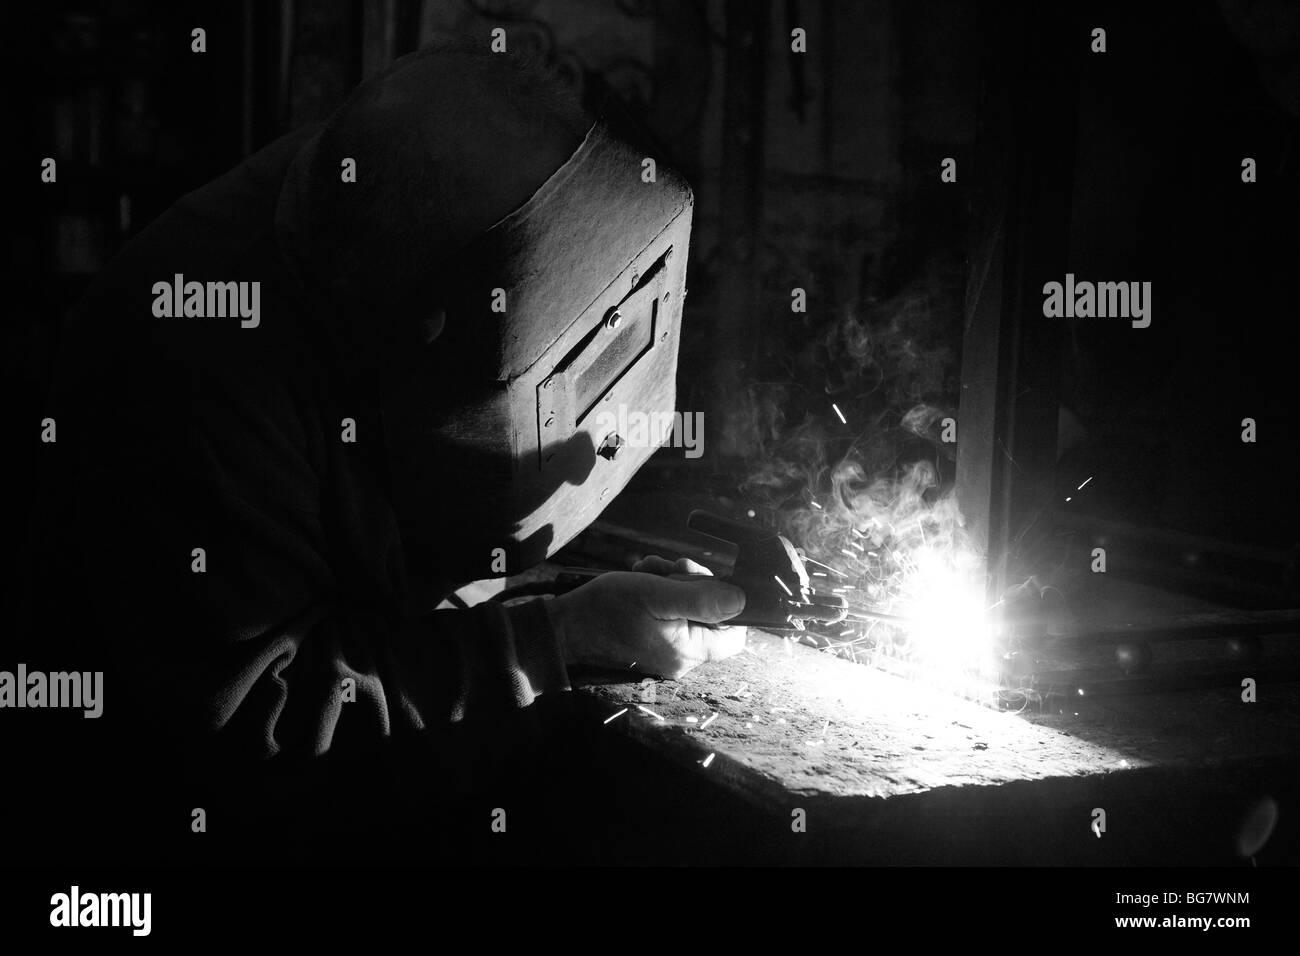 welder arc welding with mask - Stock Image